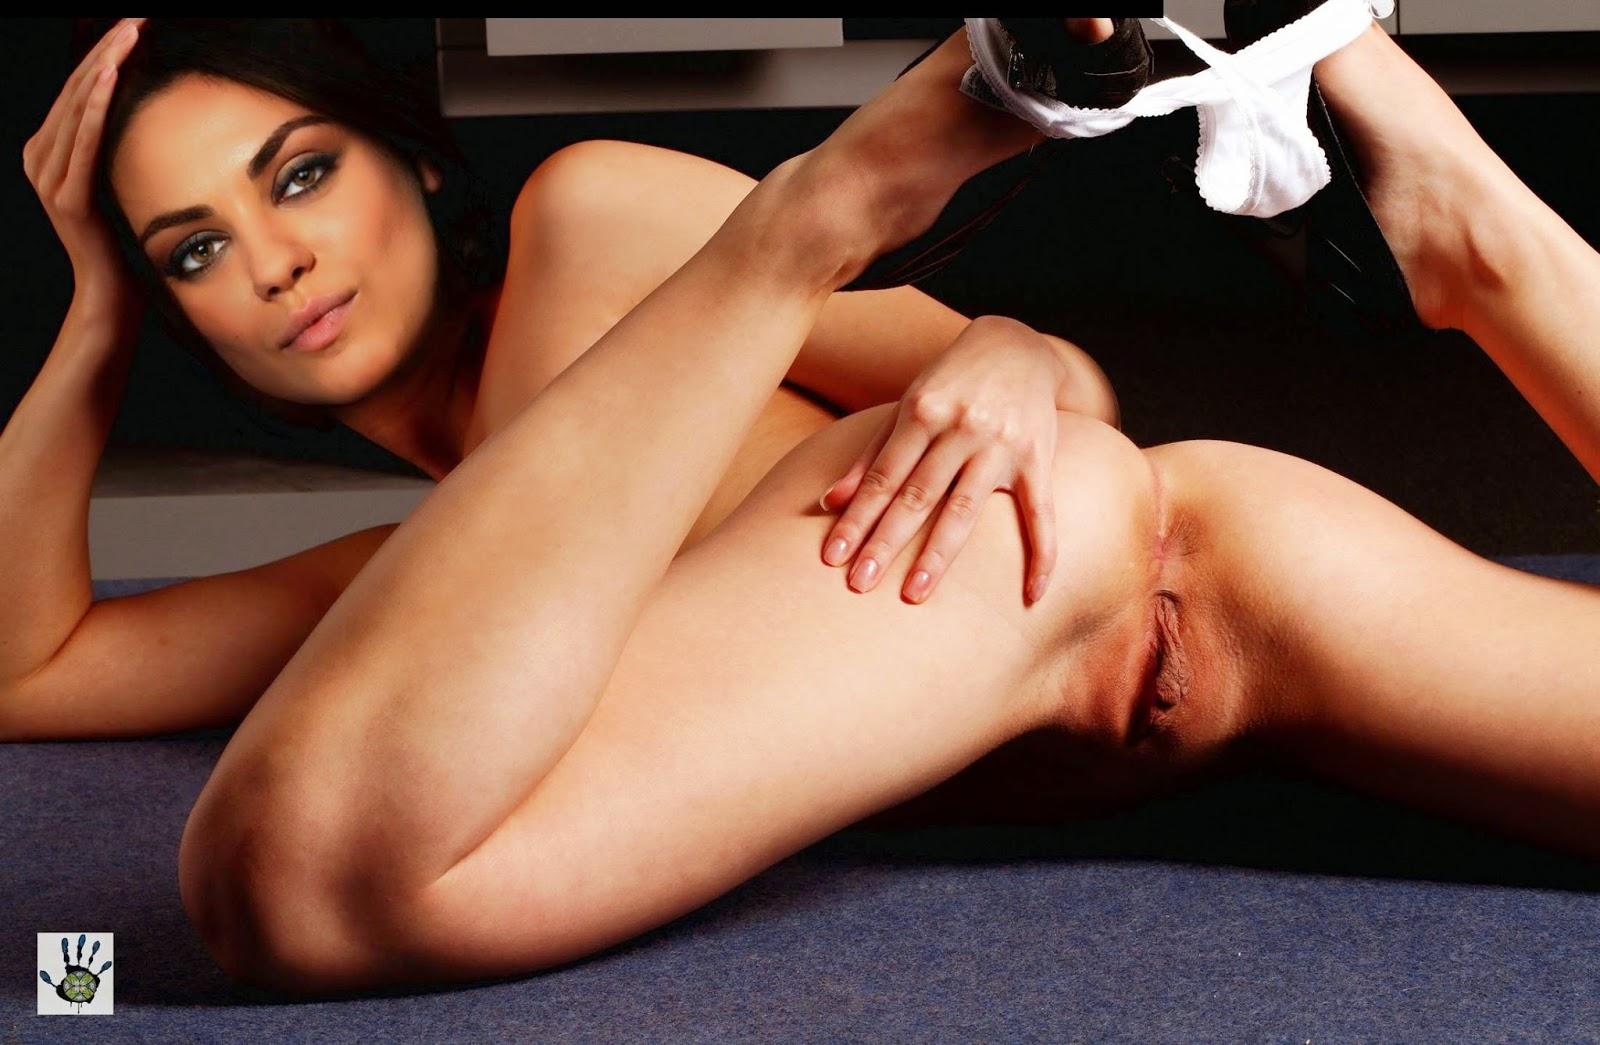 Мила порно актер картинки фото 6-559